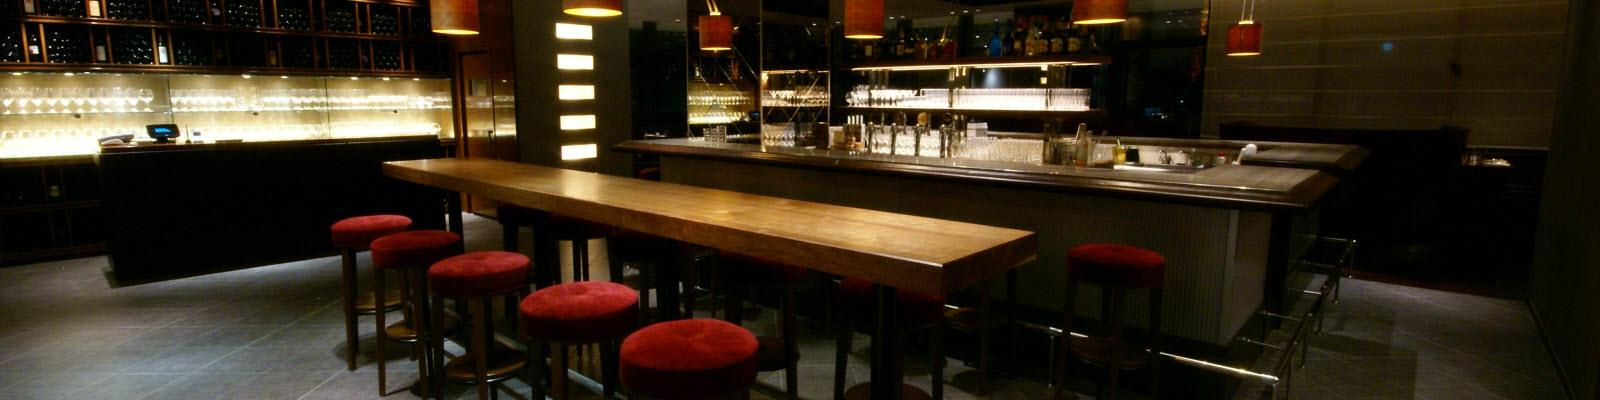 Modern bar design and furniture